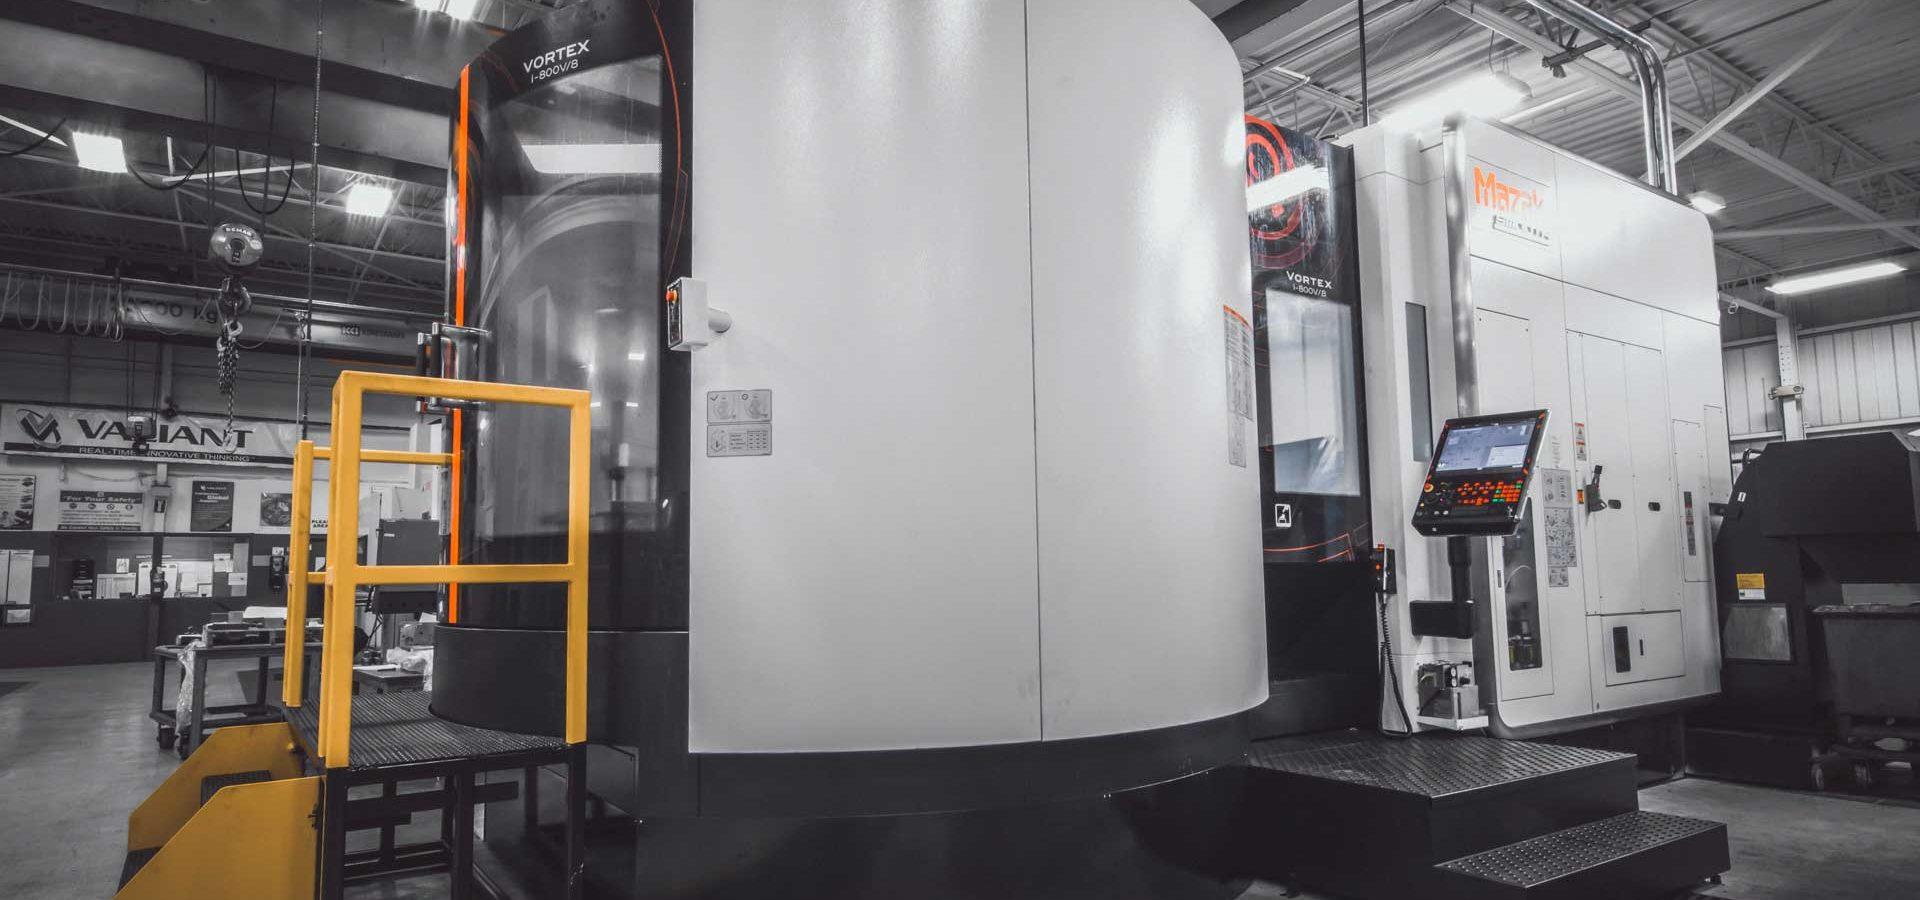 Valianttms Mold Mazak Iv800v8 Vertical Machining Center